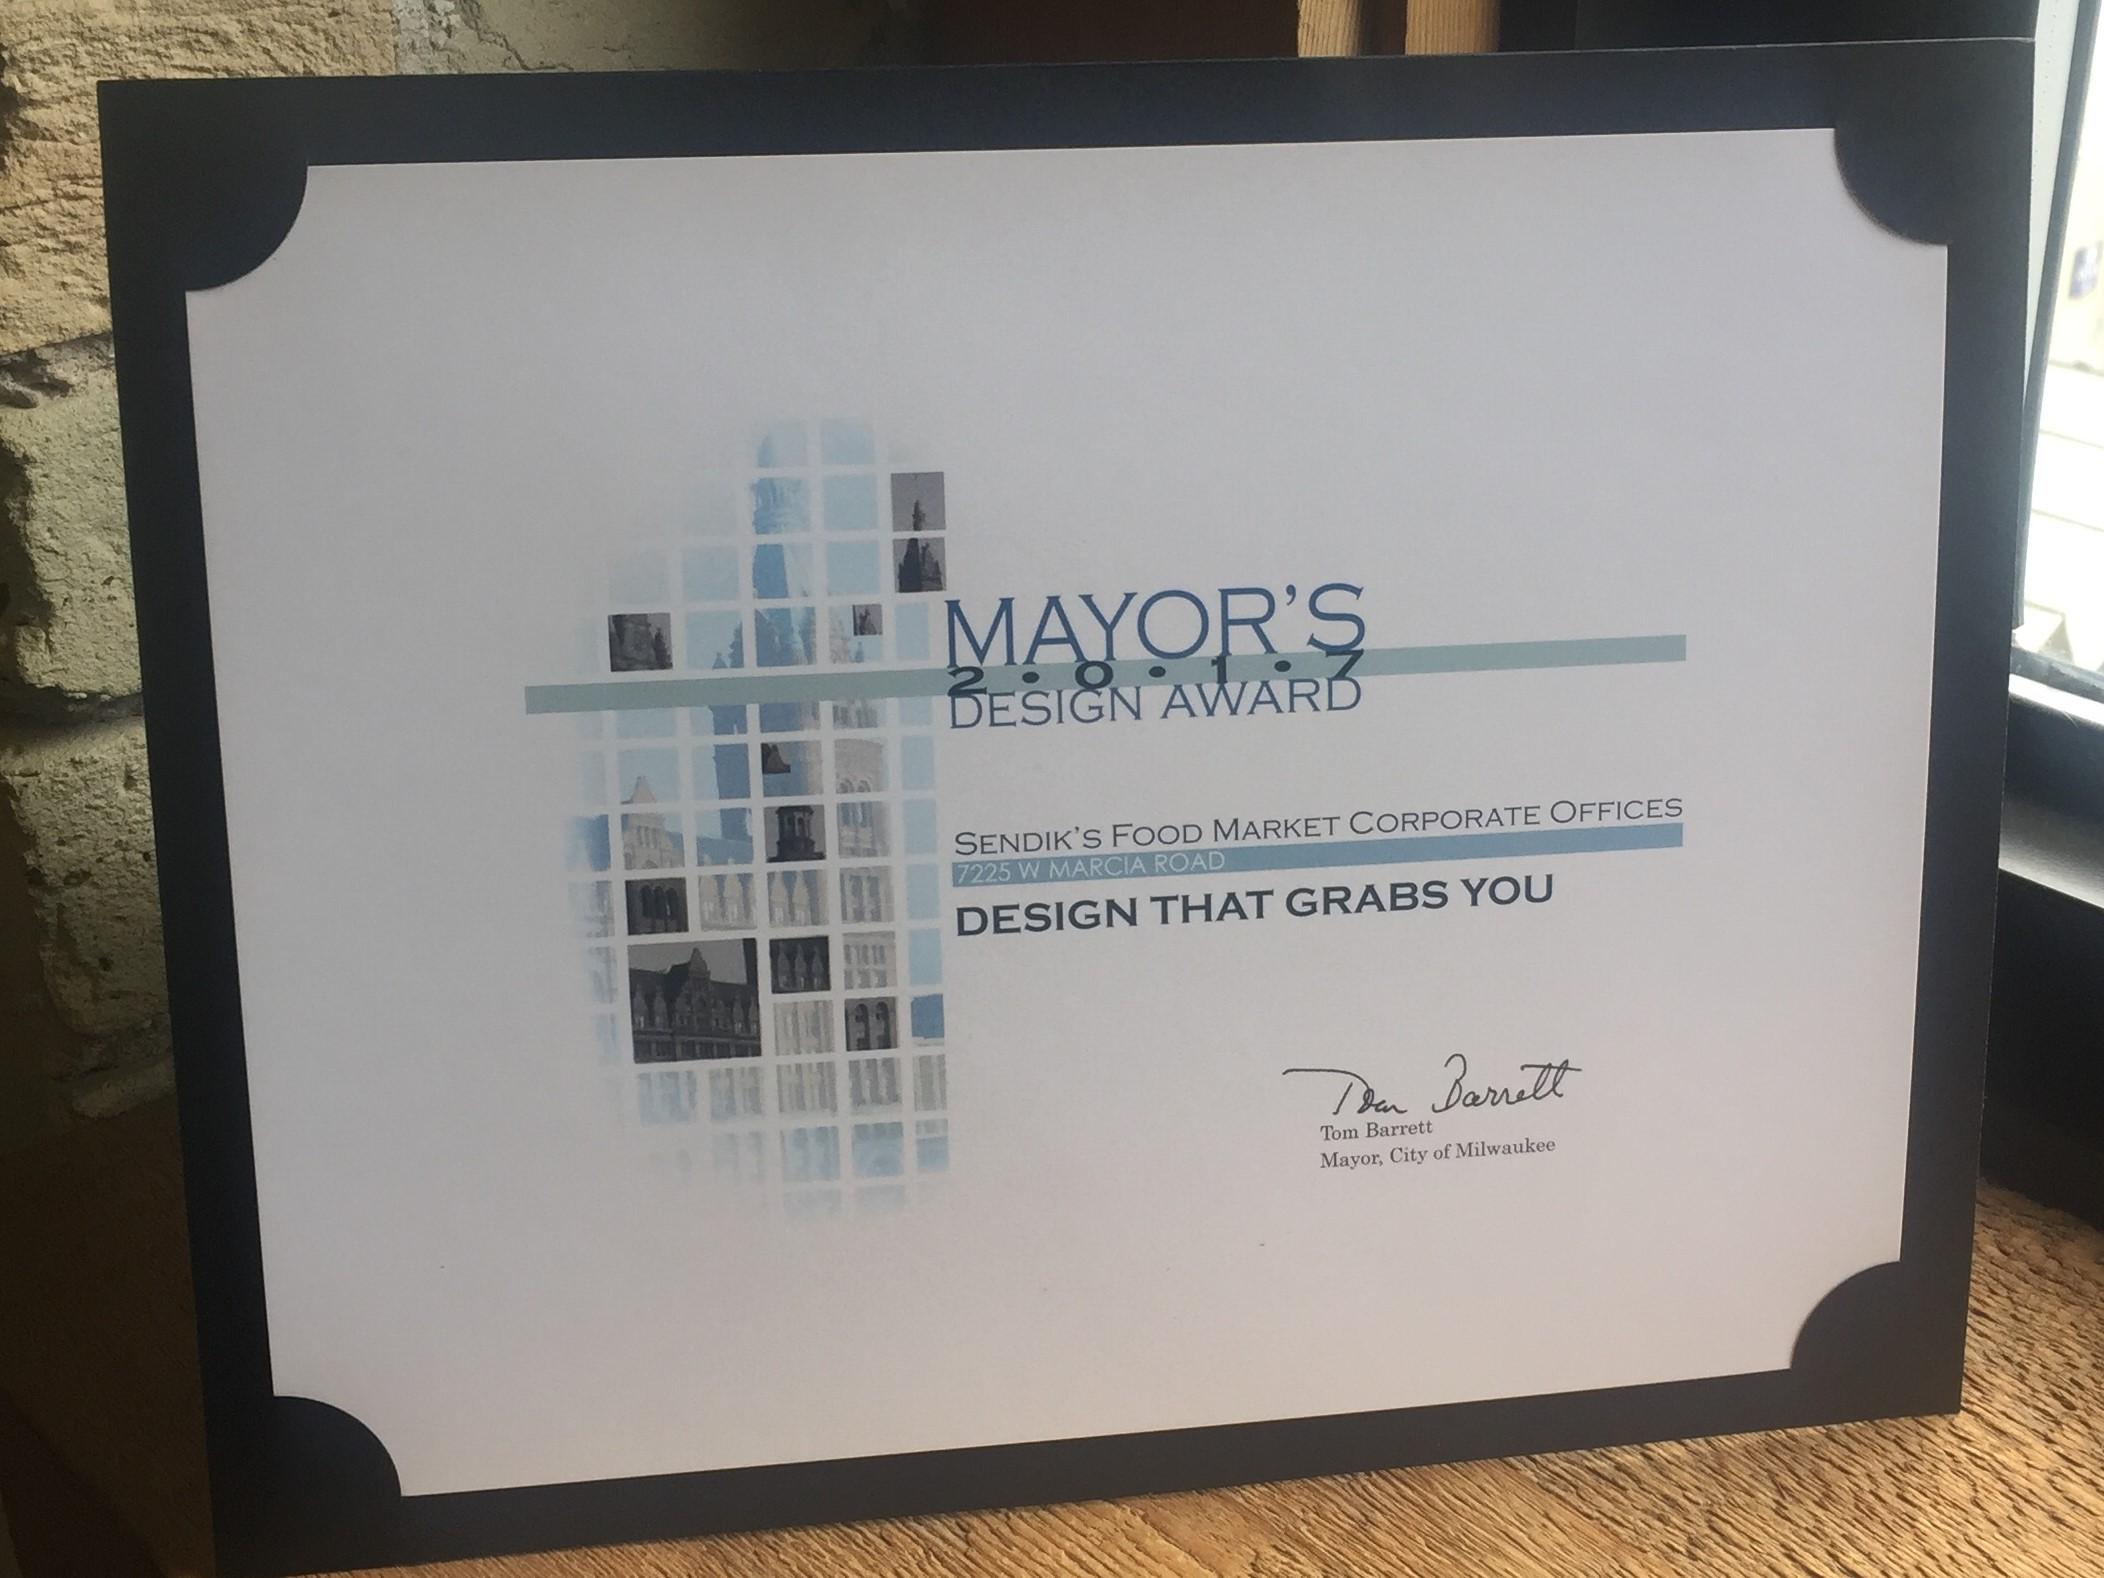 Madisen Maher Architects Mma Announces Mayor S Design